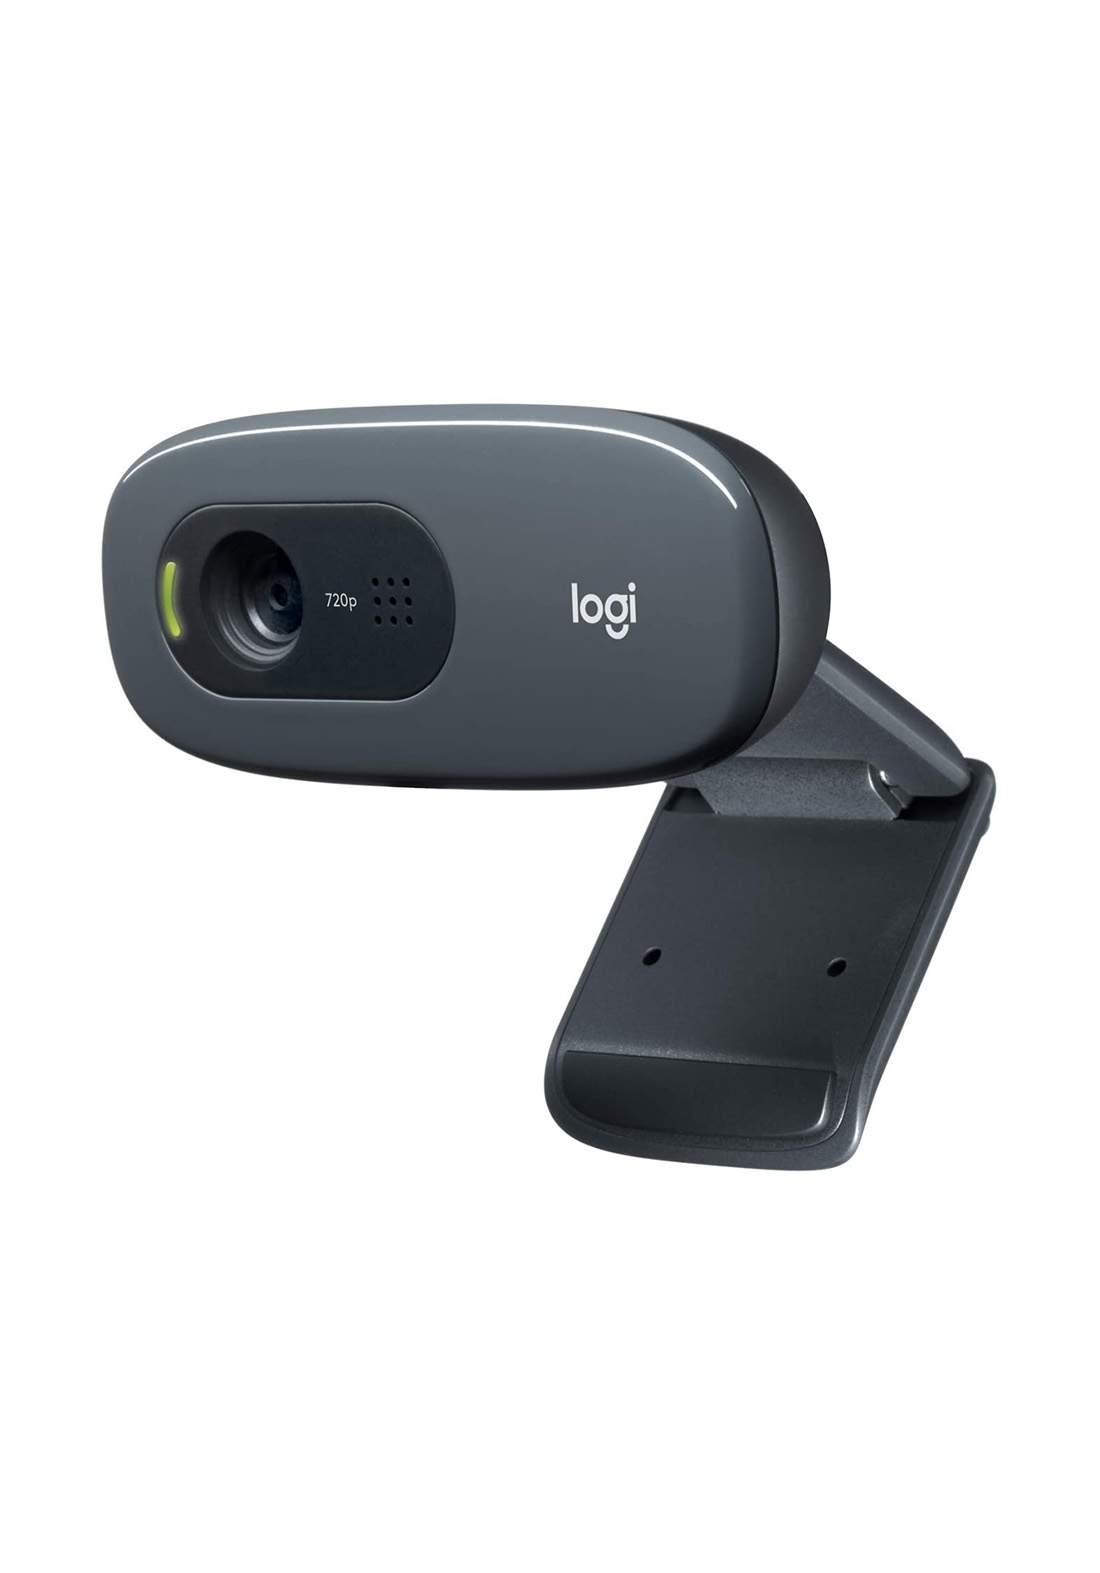 Logitech C270 Desktop or Laptop HD 720p Widescreen Webcam - Black  كاميرا